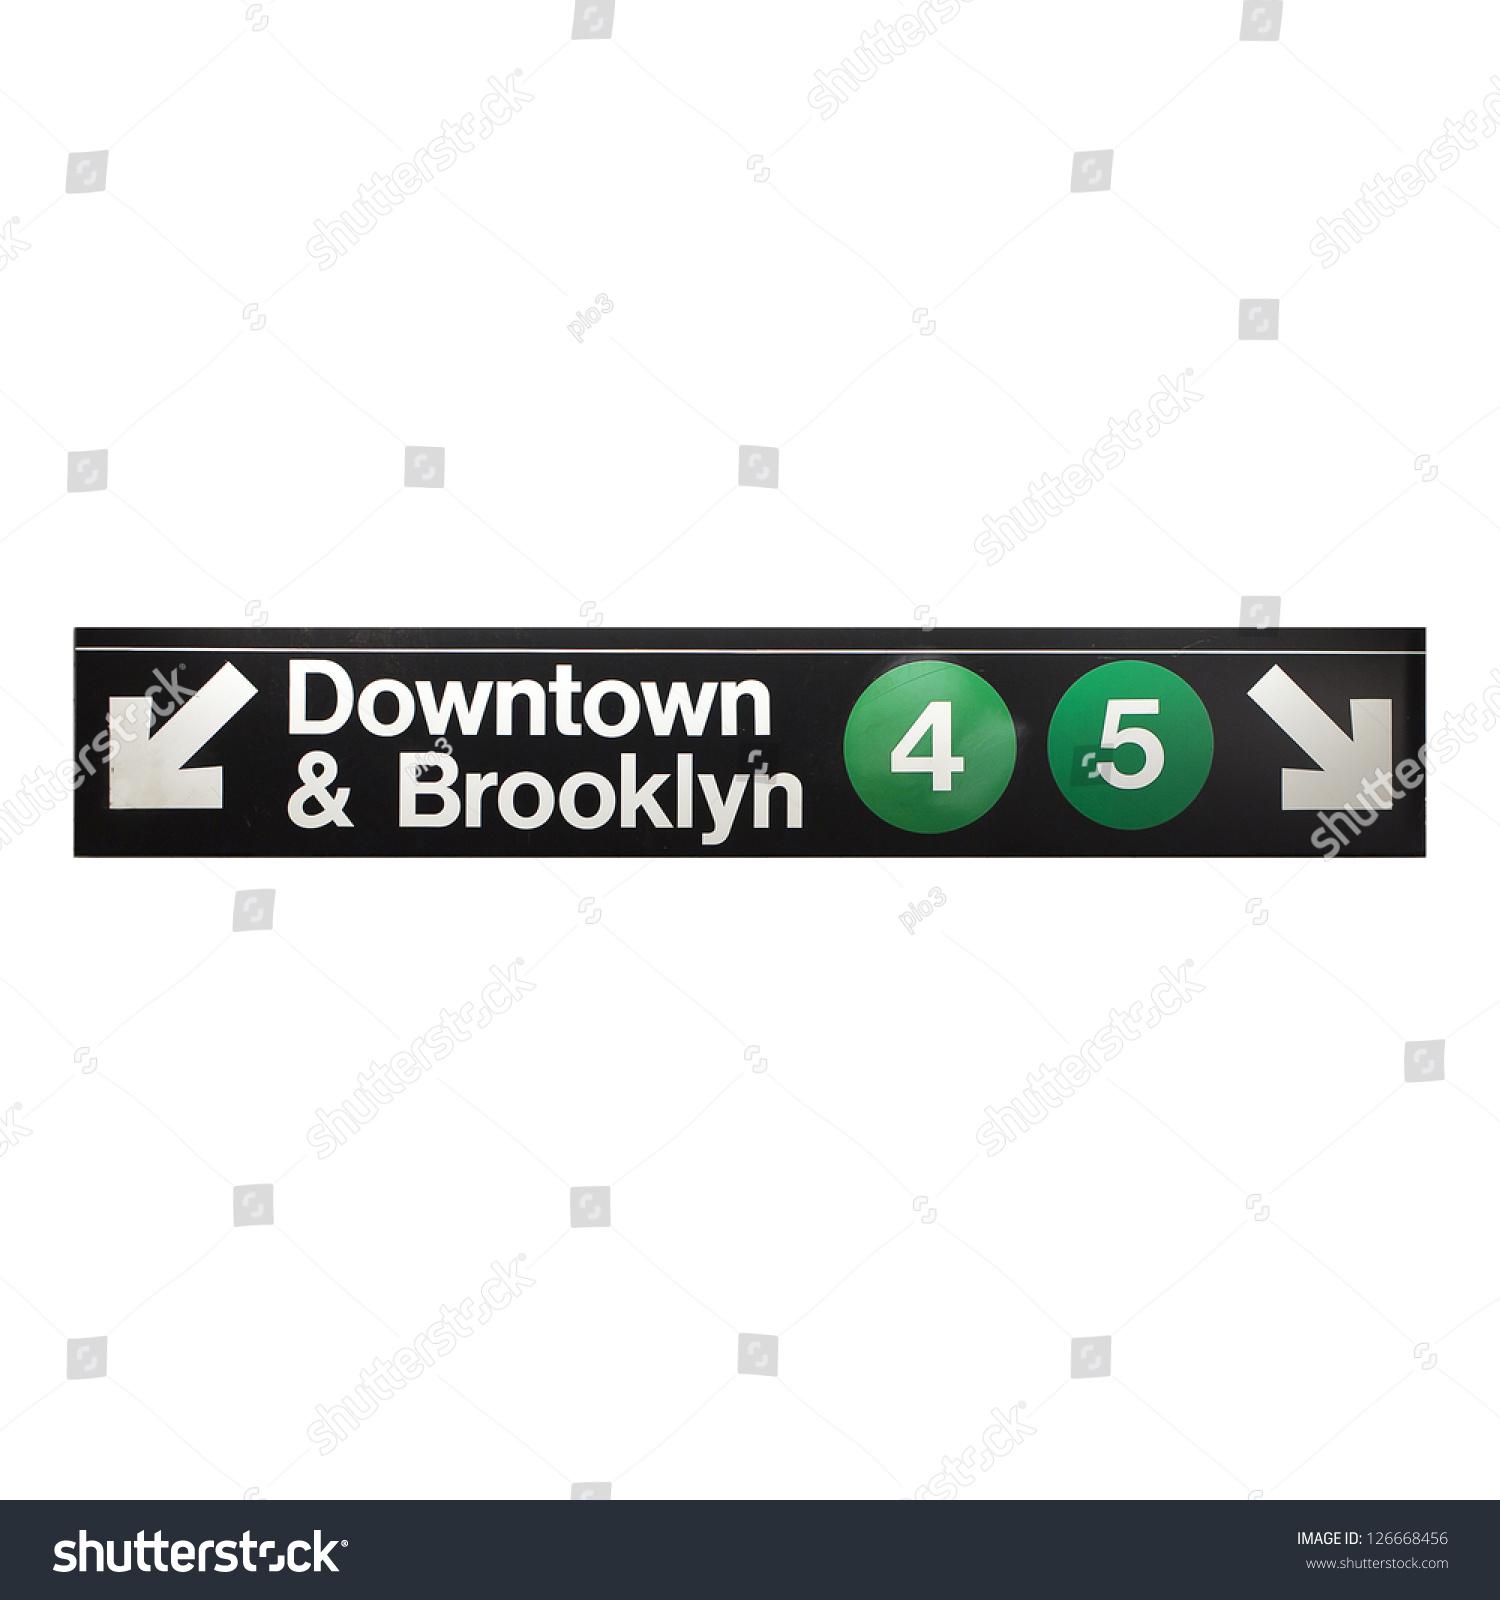 Stock Photo New York